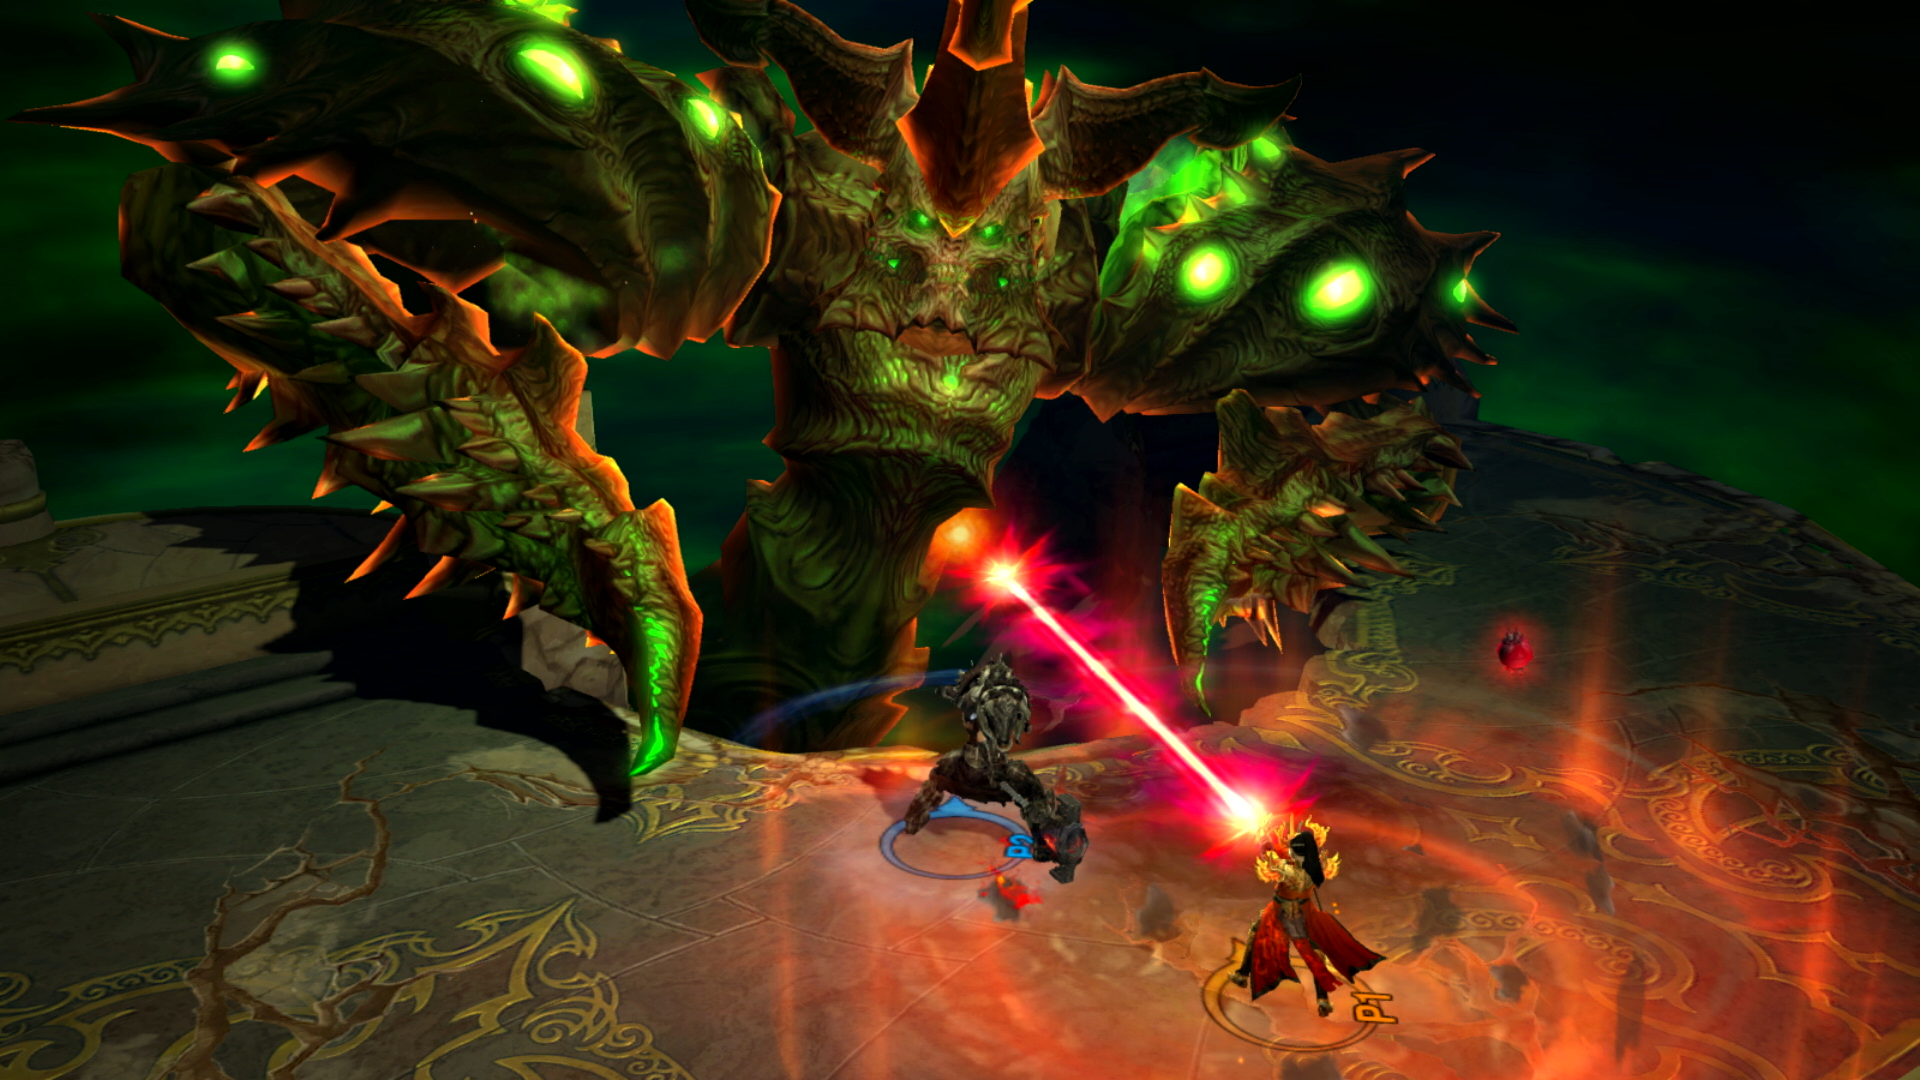 Diablo III: Eternal Collection releases on Nintendo Switch